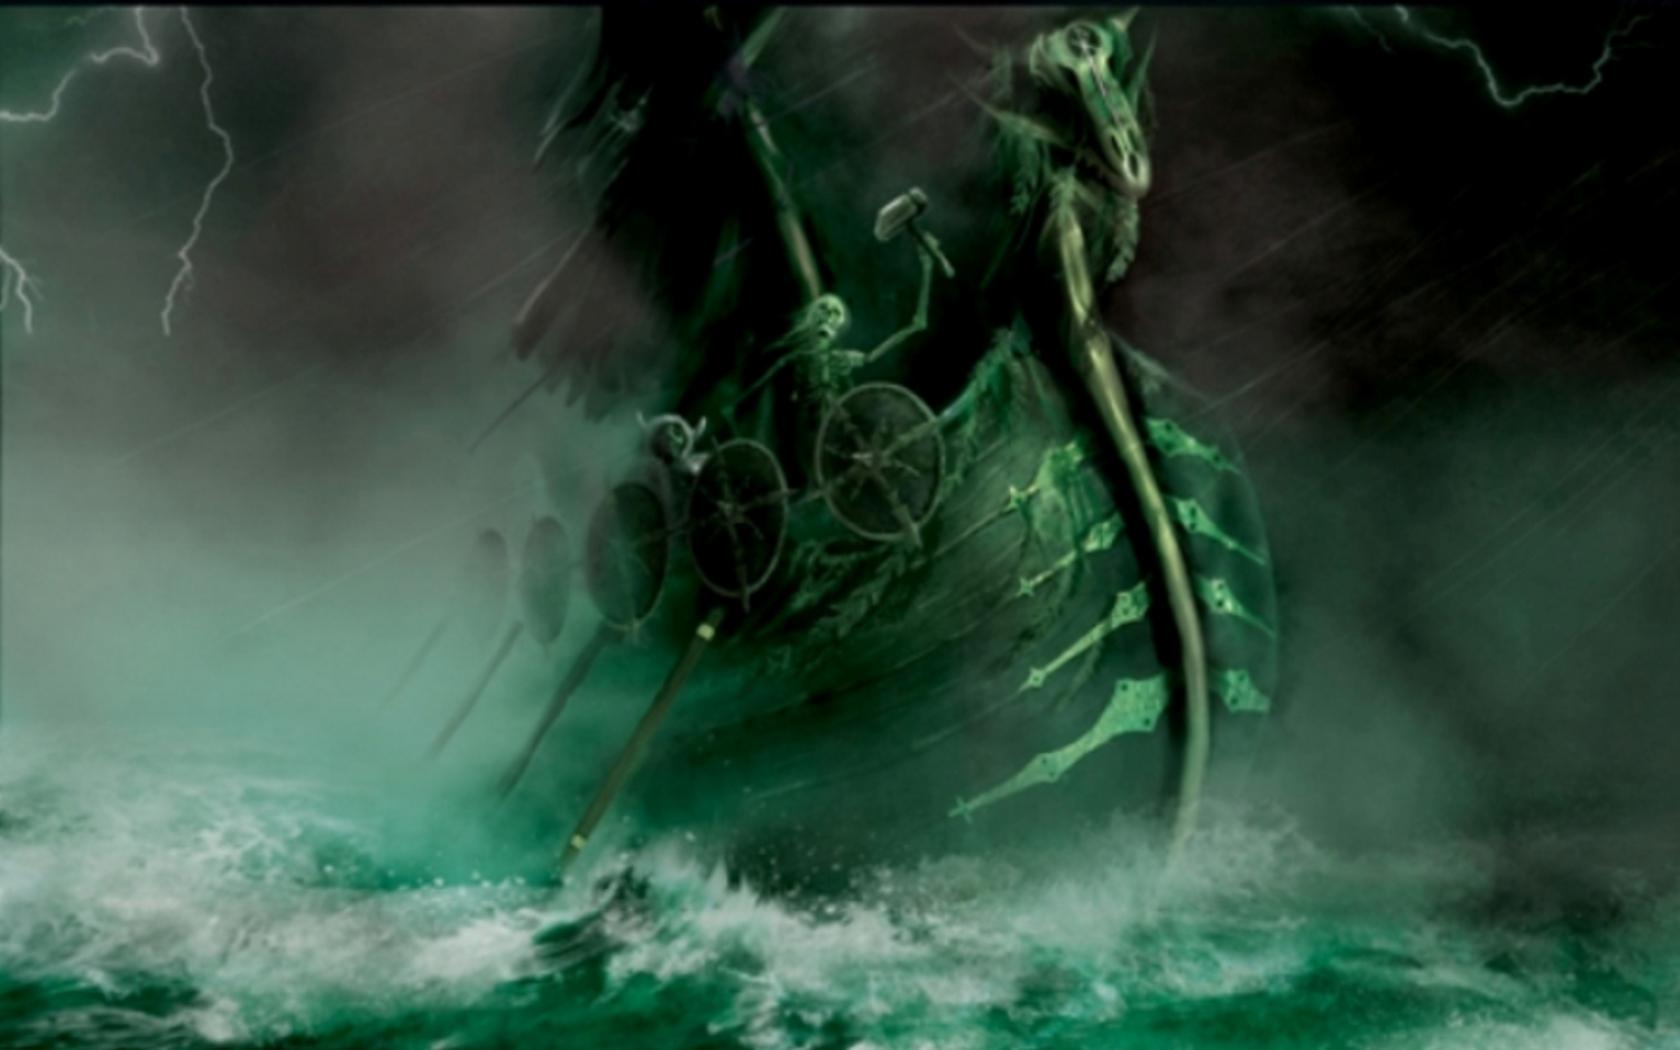 Hd Wallpapers Viking Ship Battle 336 X 280 19 Kb Jpeg HD Wallpapers 1680x1050